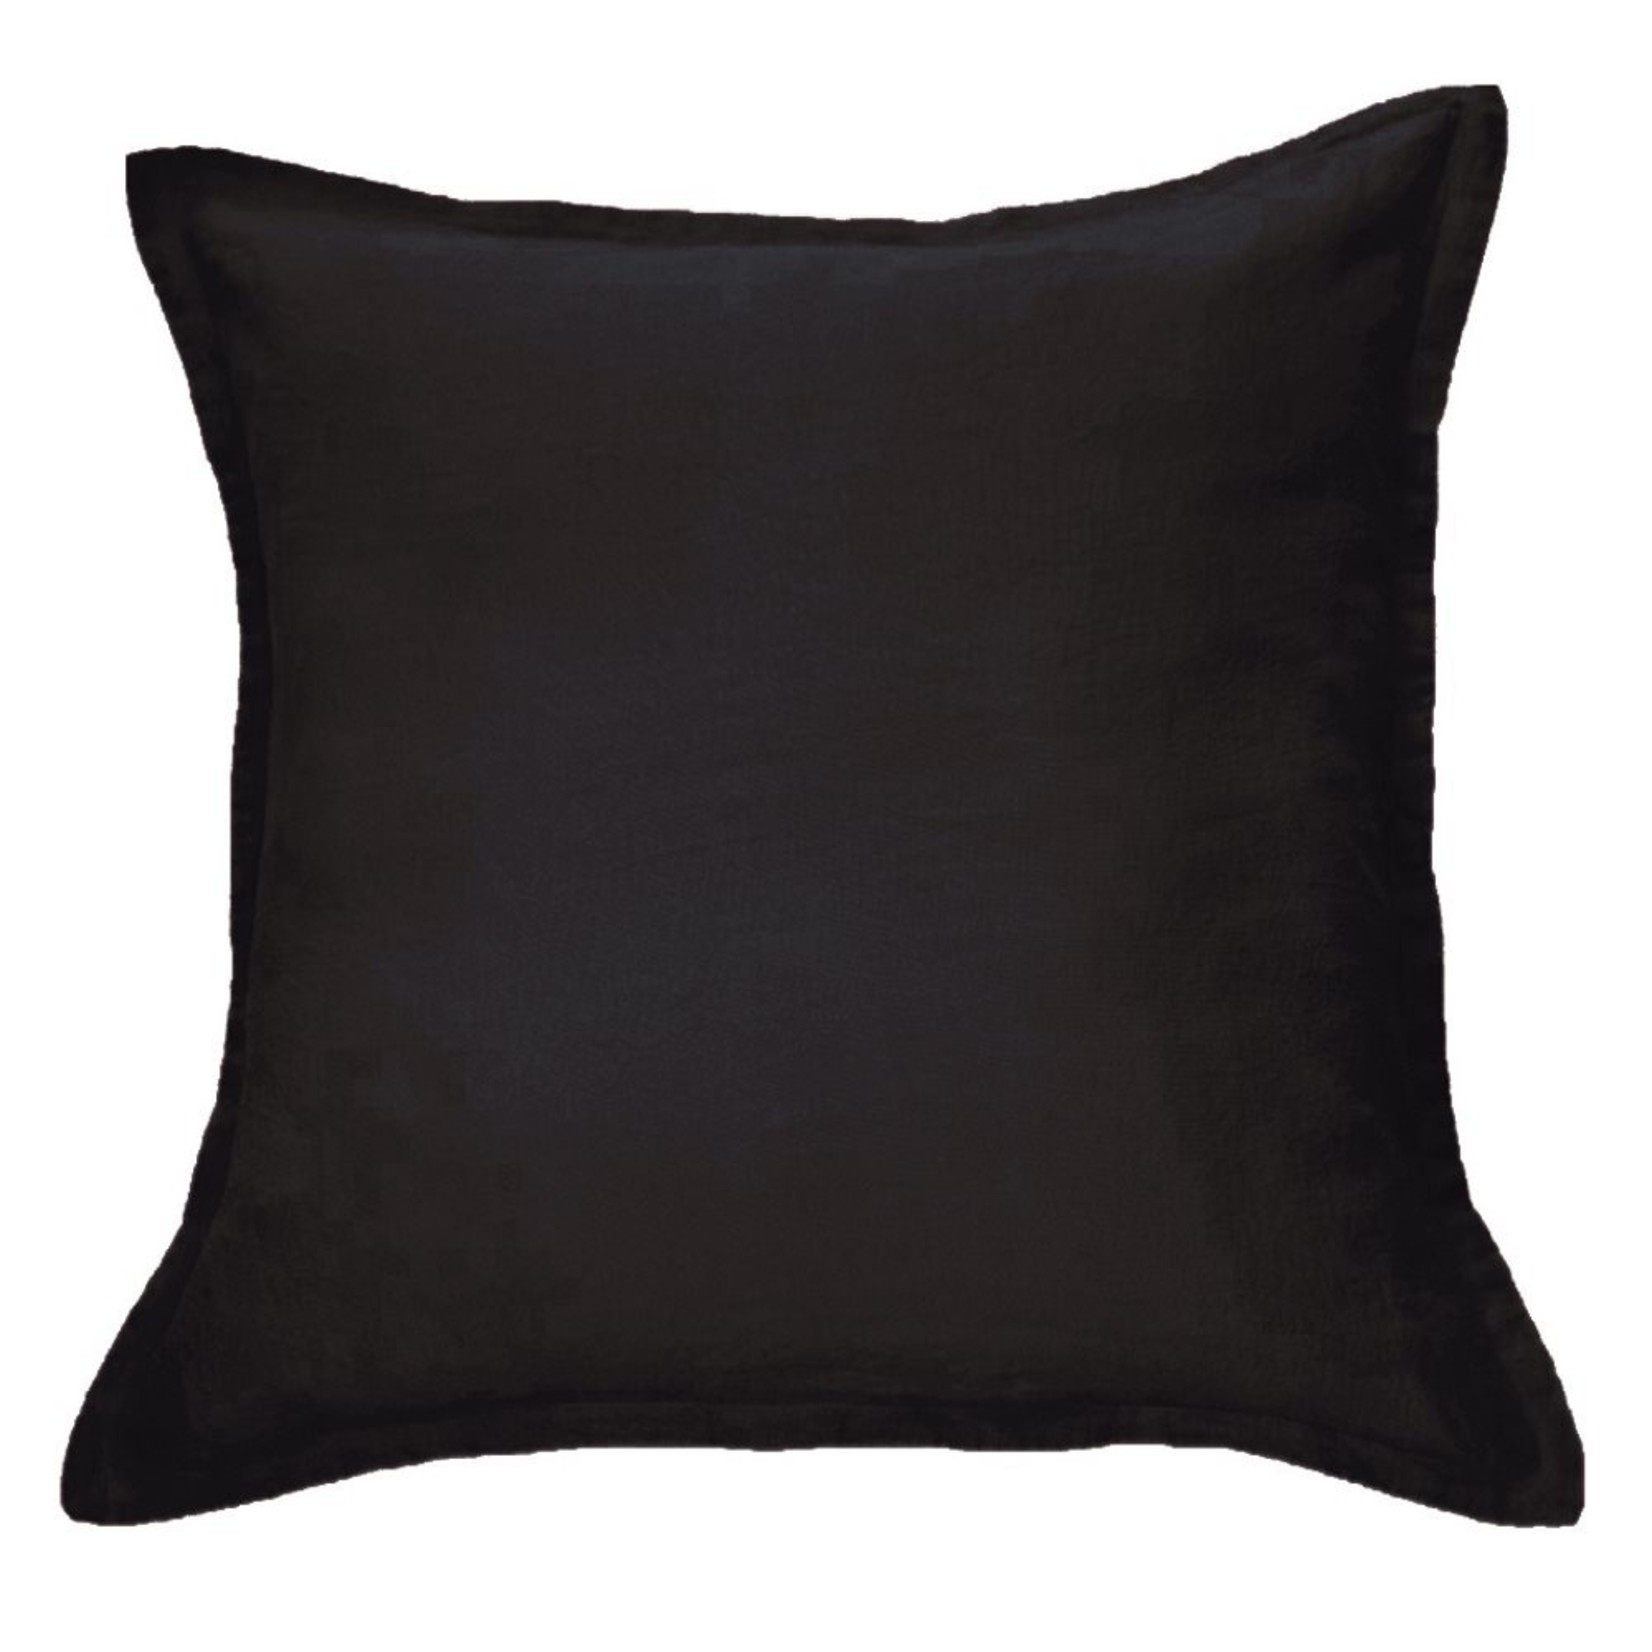 Brunelli Linen Pillow Sham Black